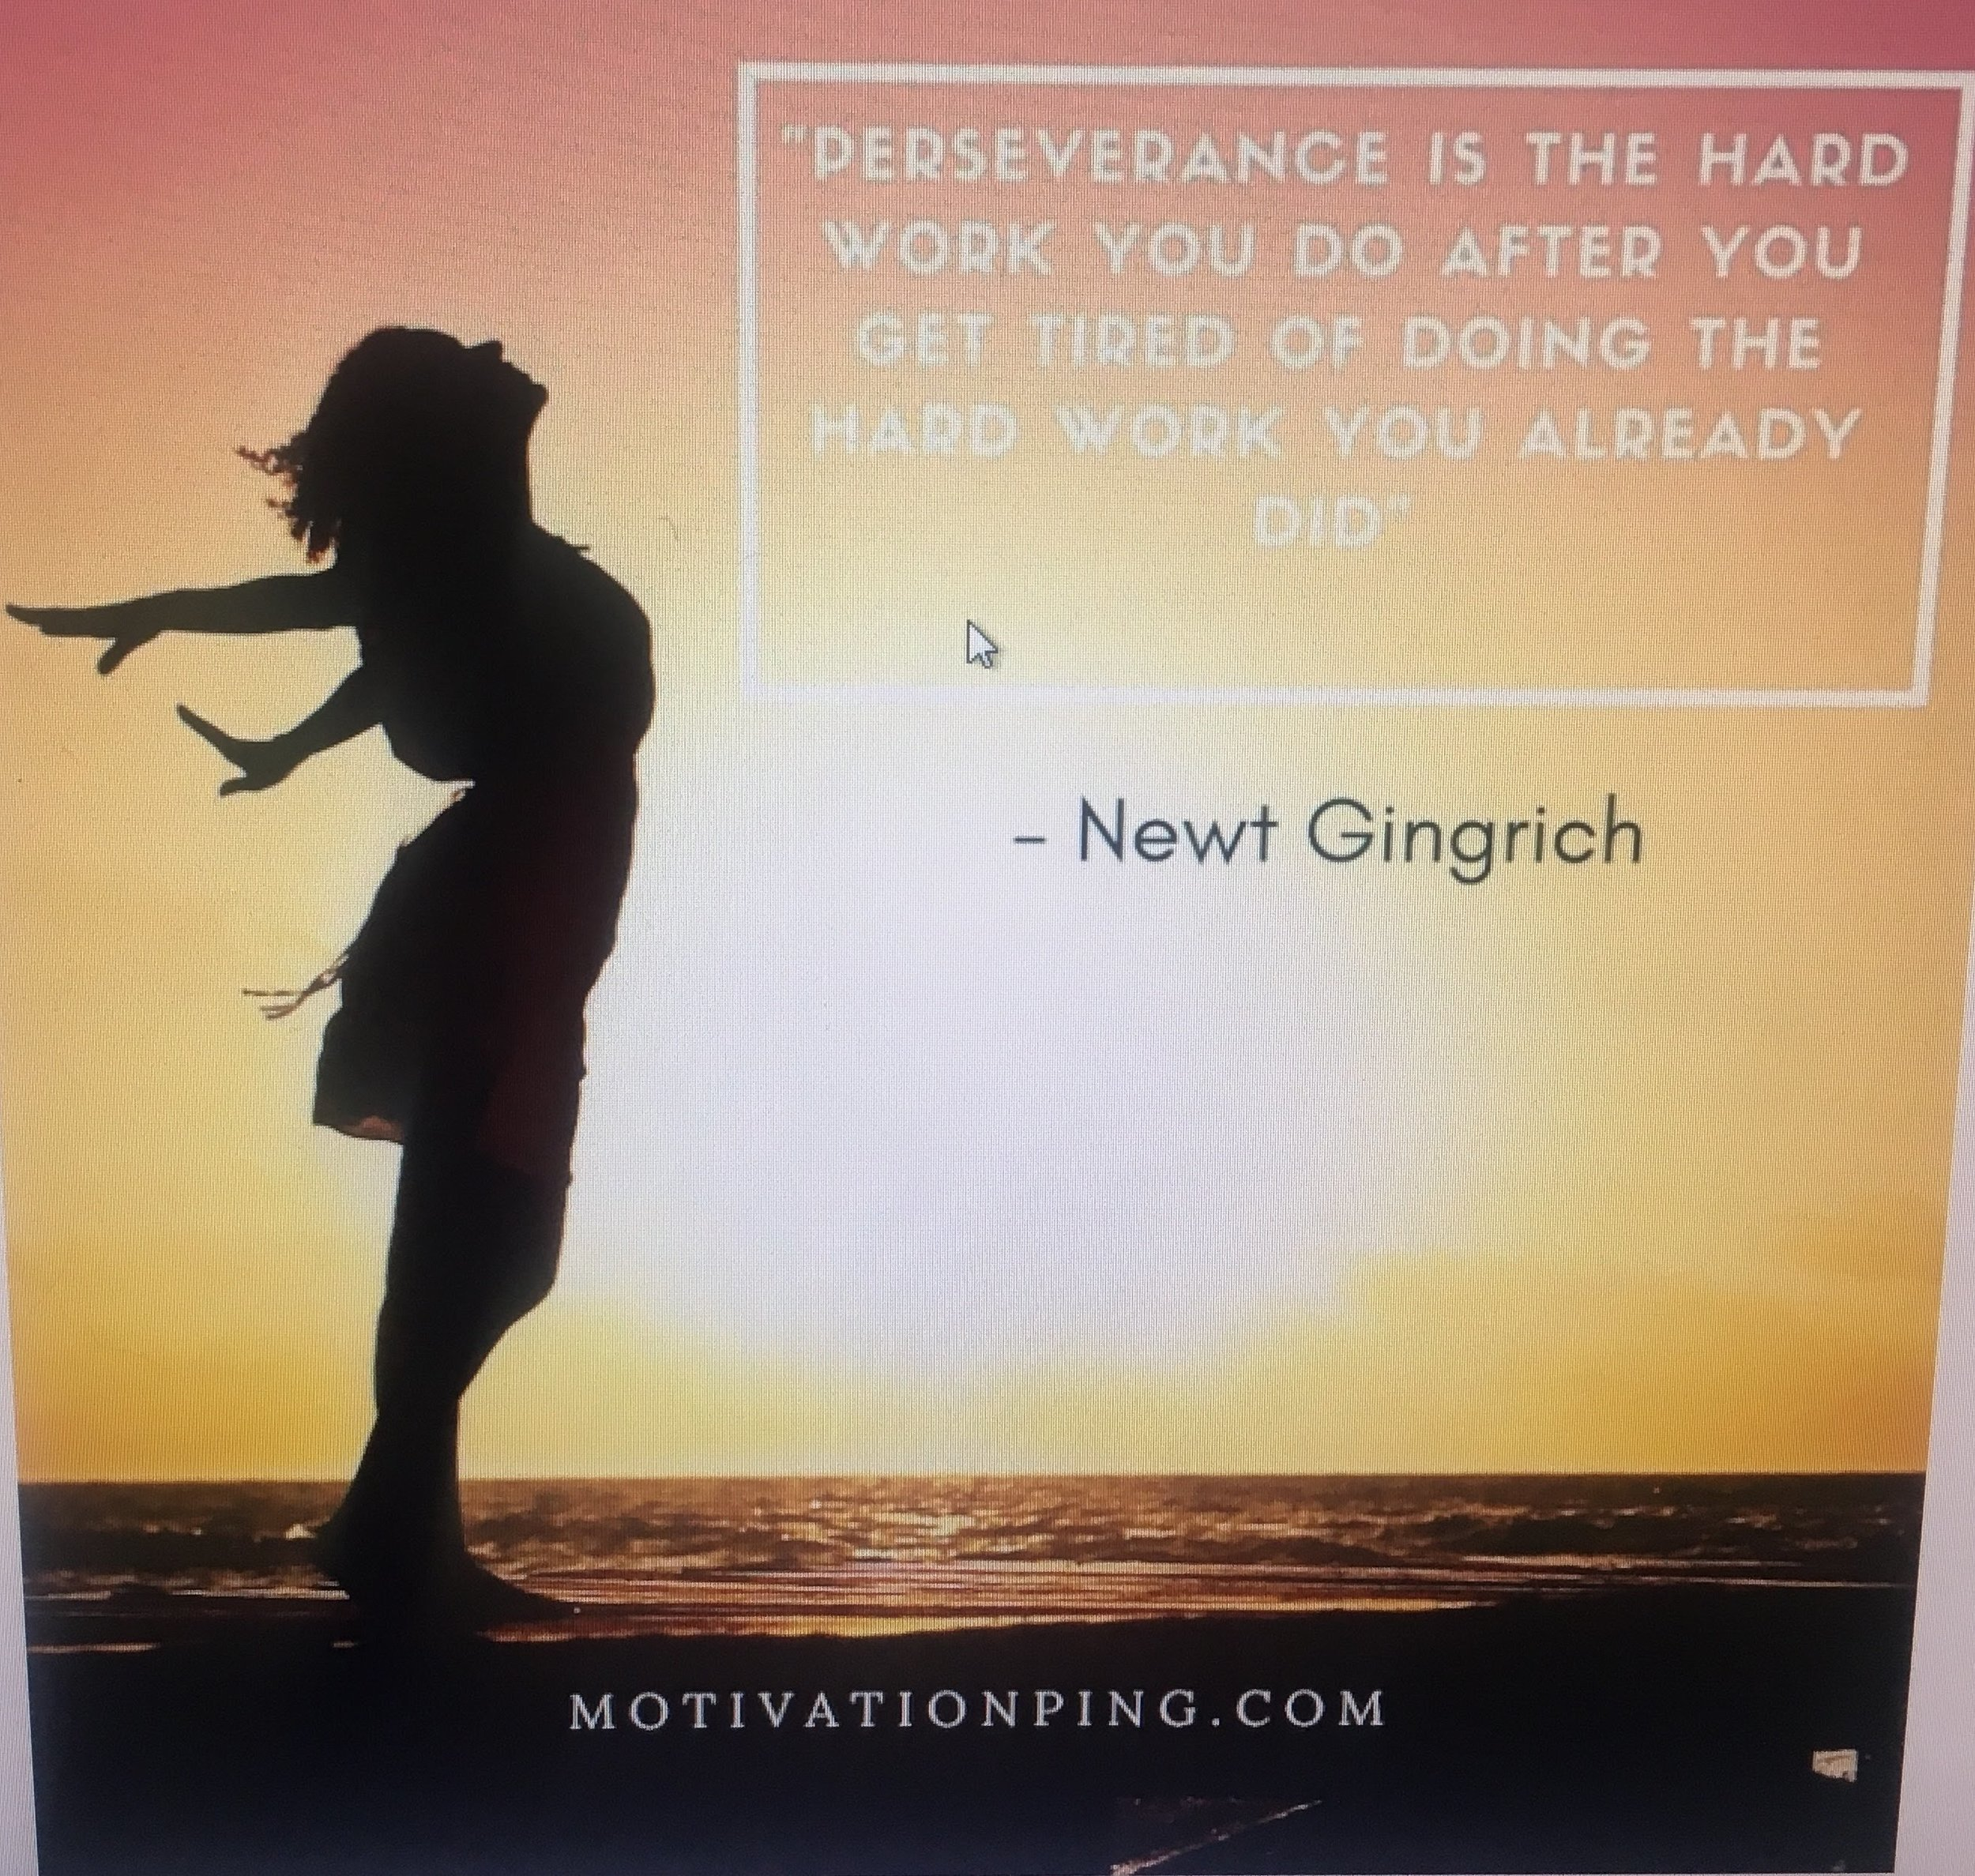 Screengrab from  www.motivationping.com